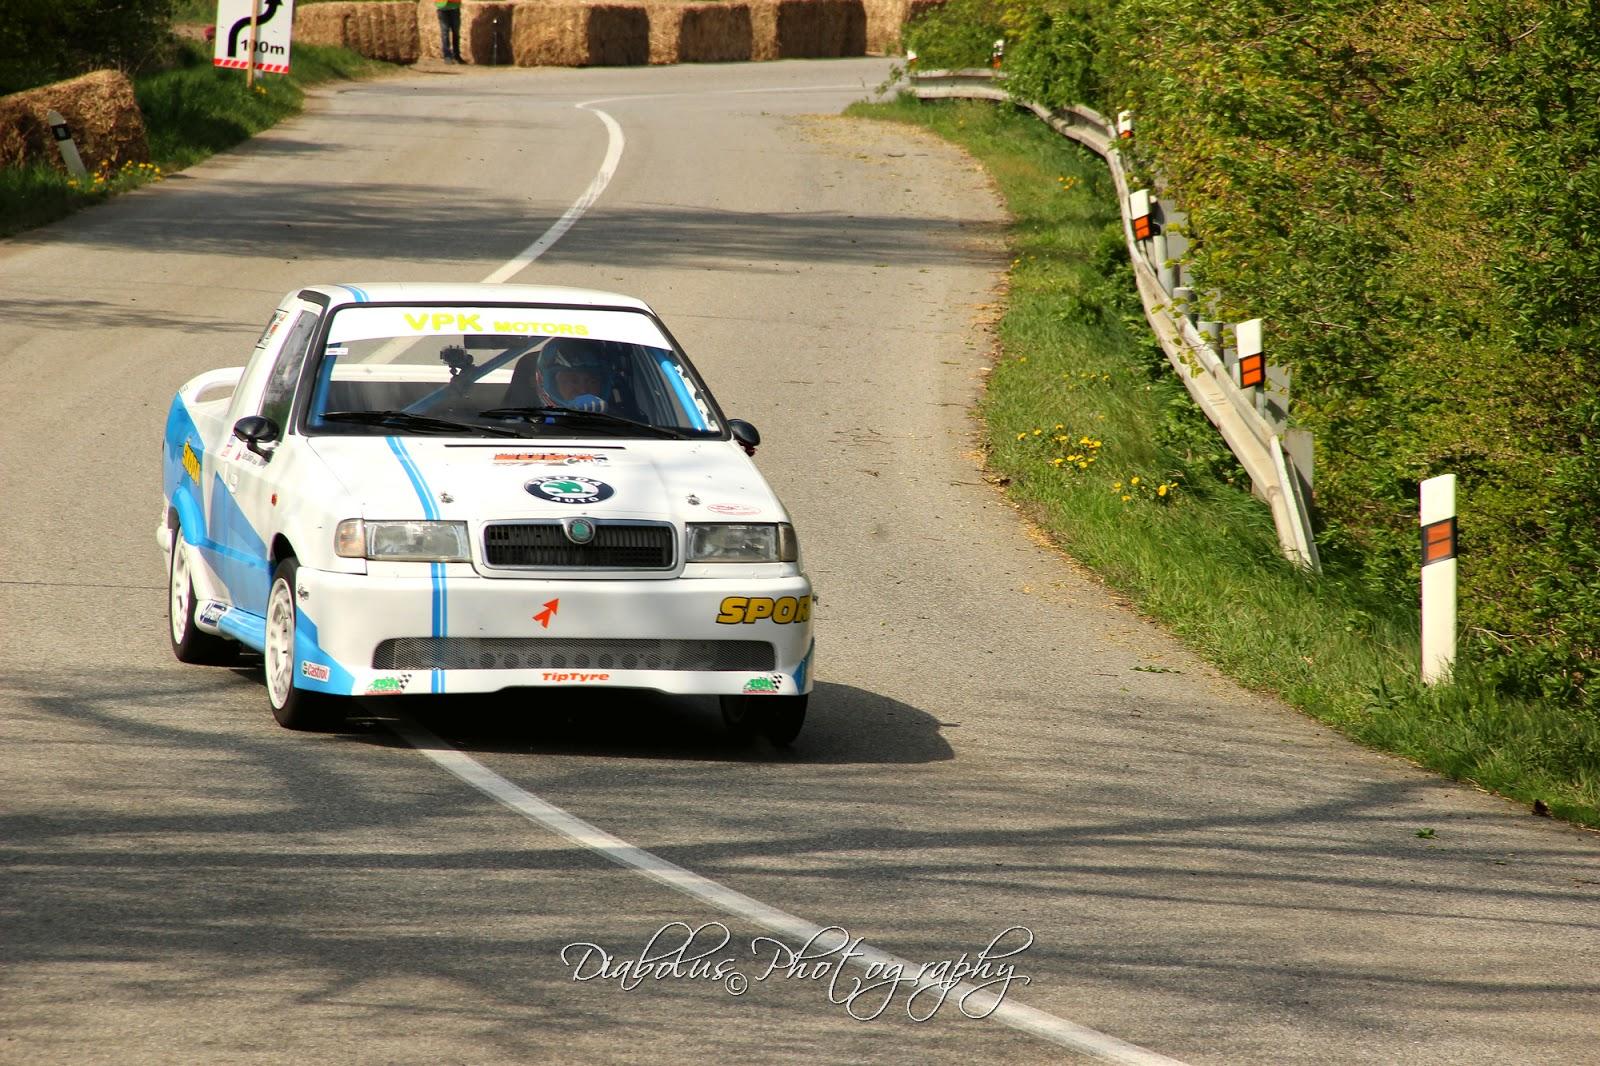 Škoda Felicia Pick-up Freestyle